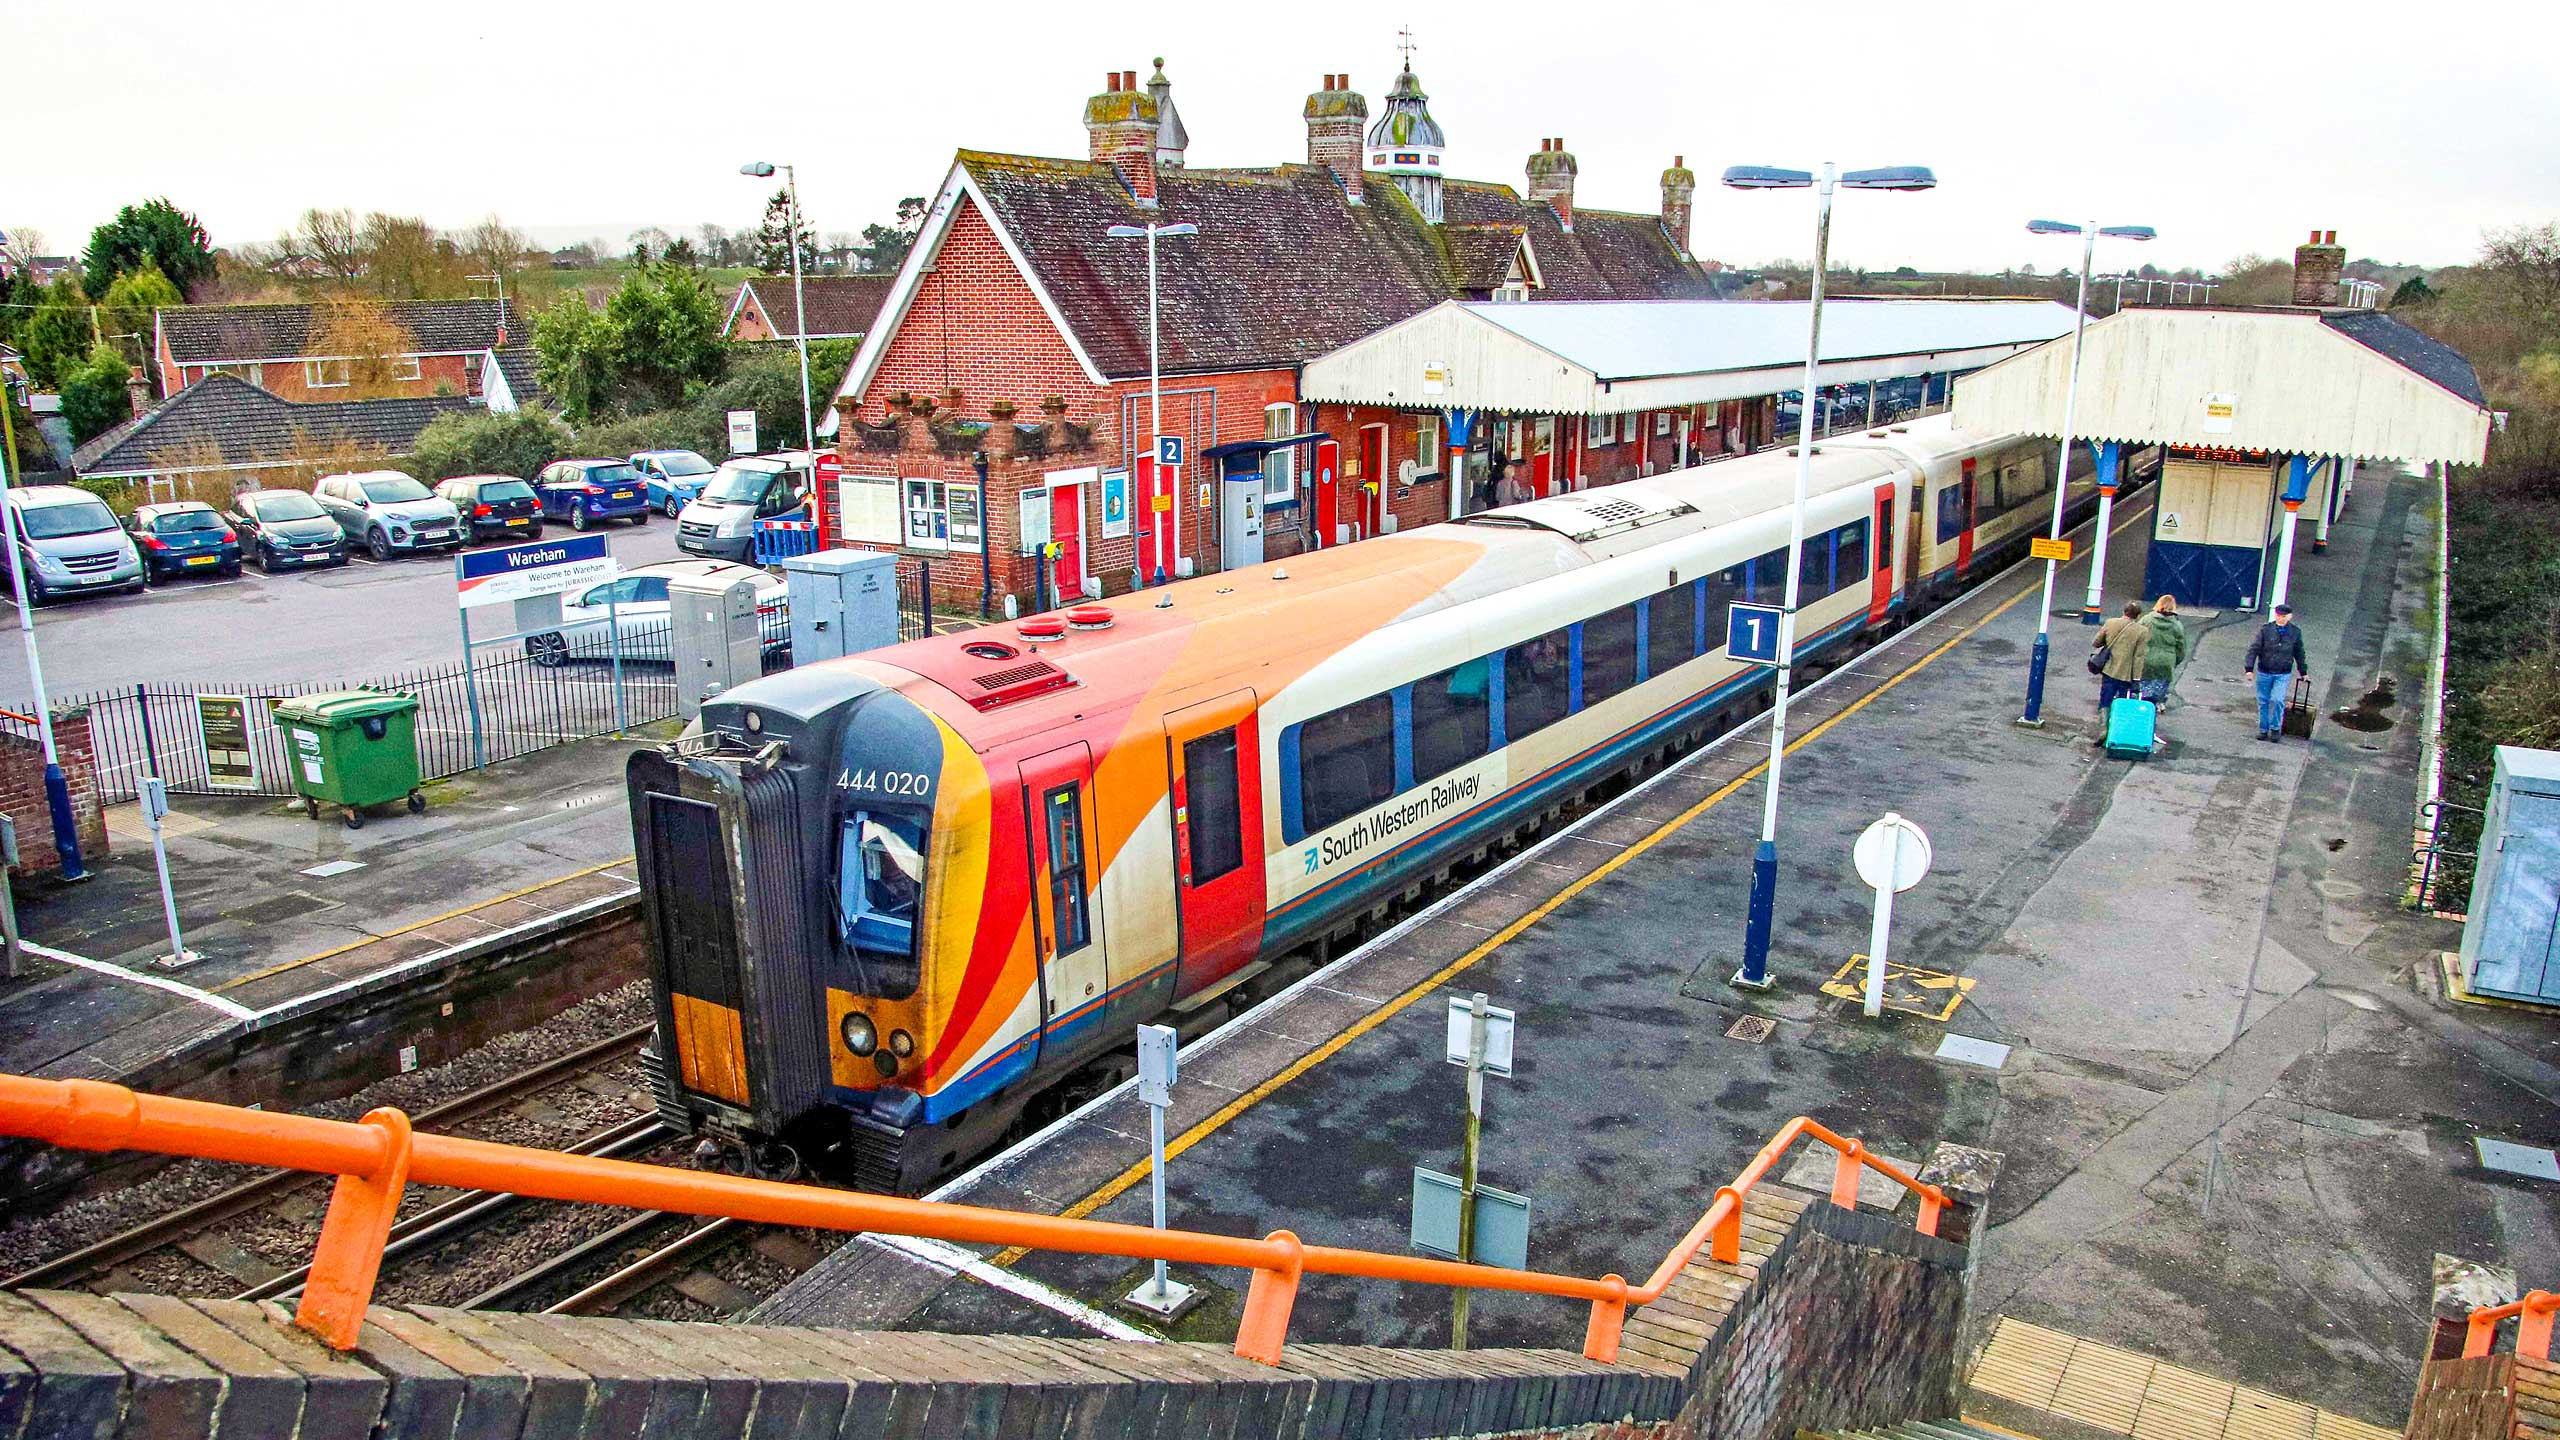 Purbeck Community Rail Partnership Wareham Train Station 003 2560x1440px